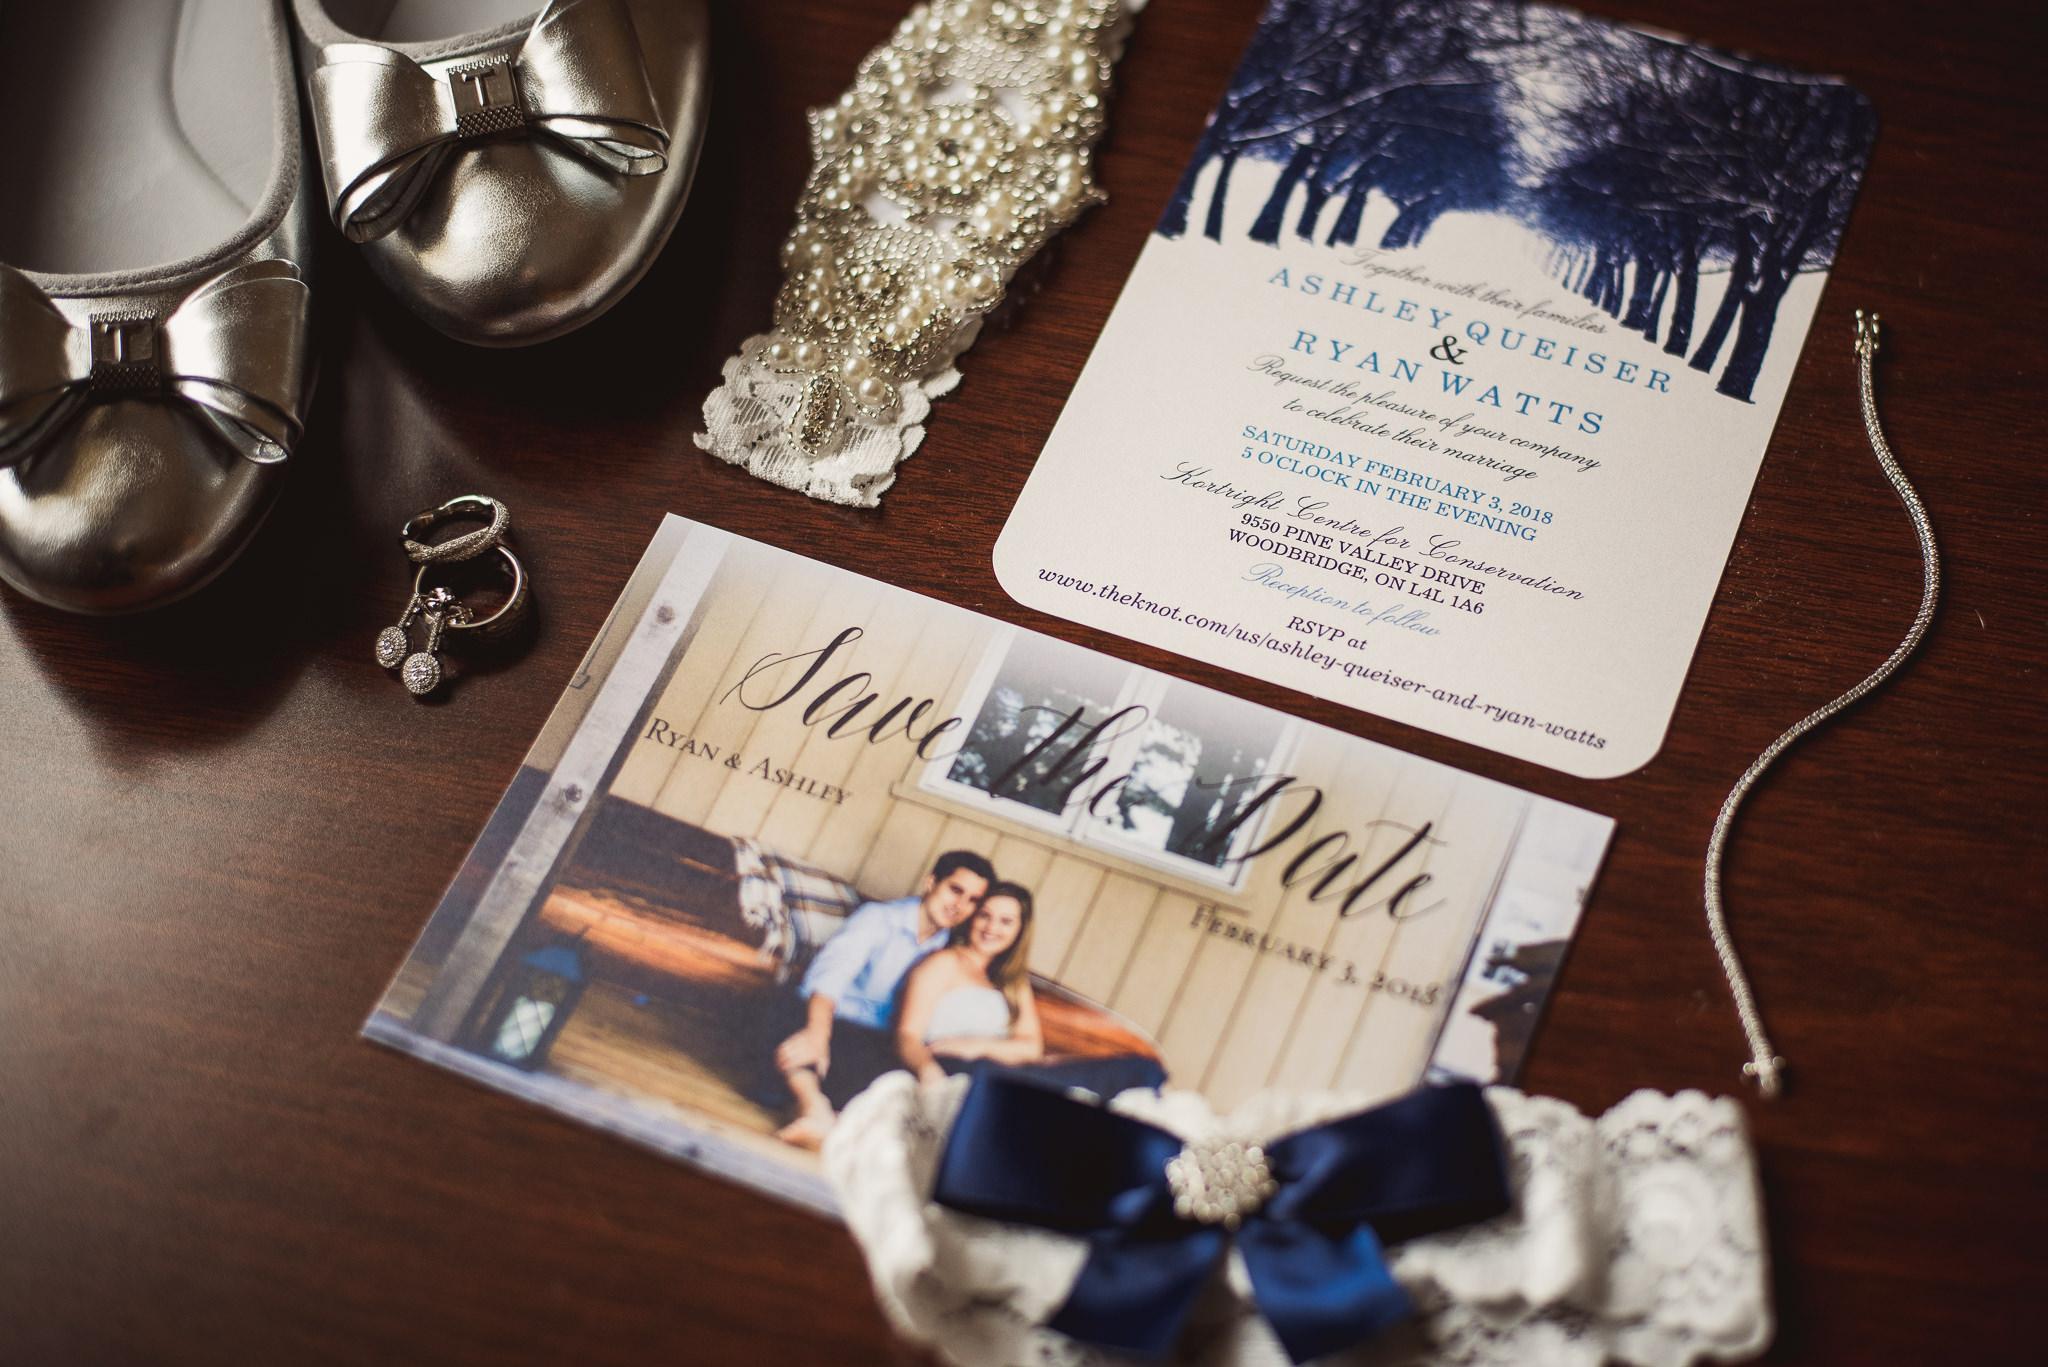 kortright center winter wedding photos 58 - Kortright Center Winter Wedding Photos